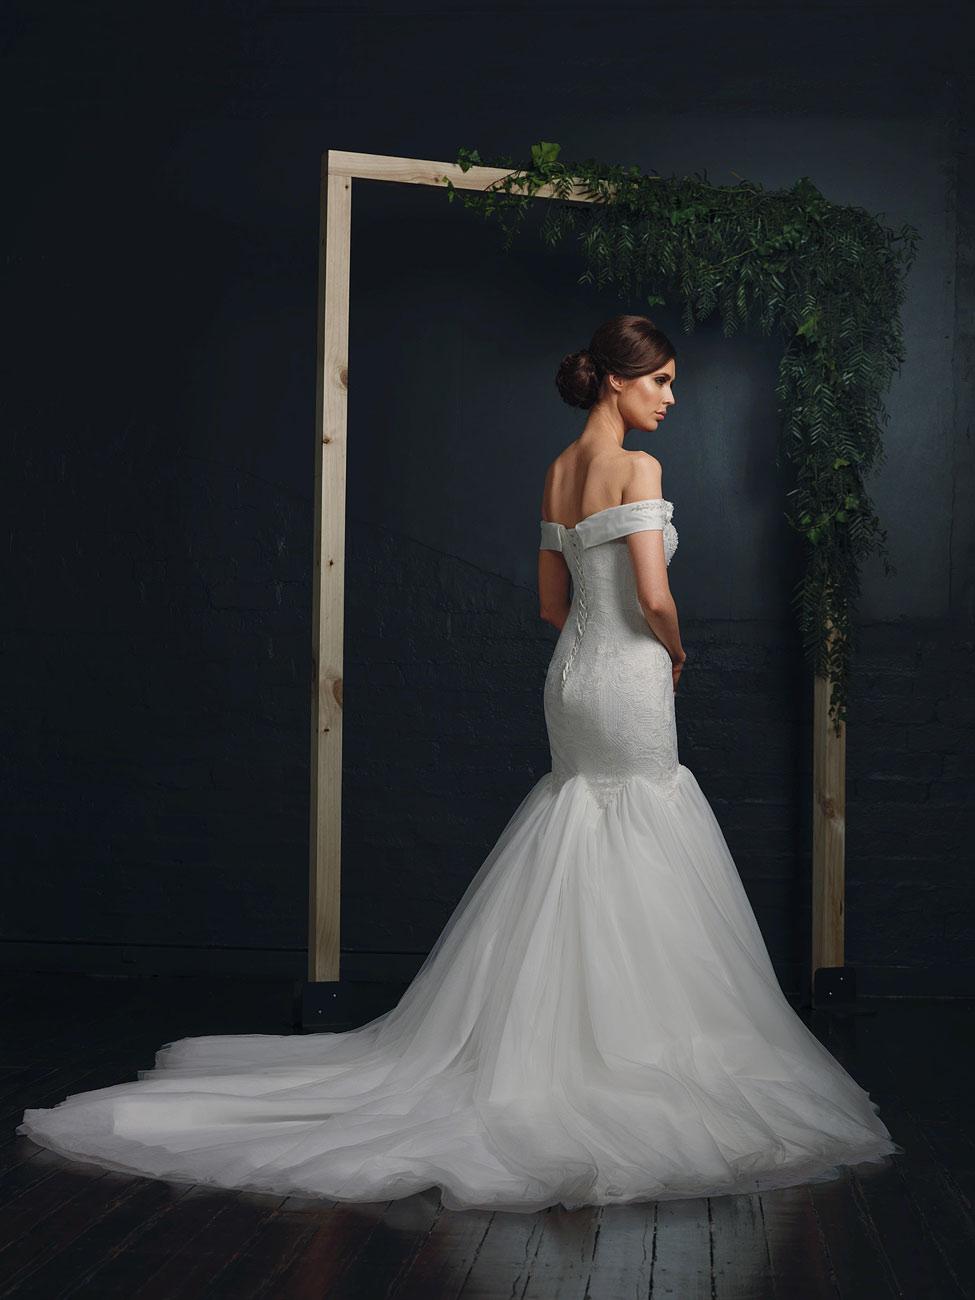 belleetblanc-wedding-photography-4.jpg